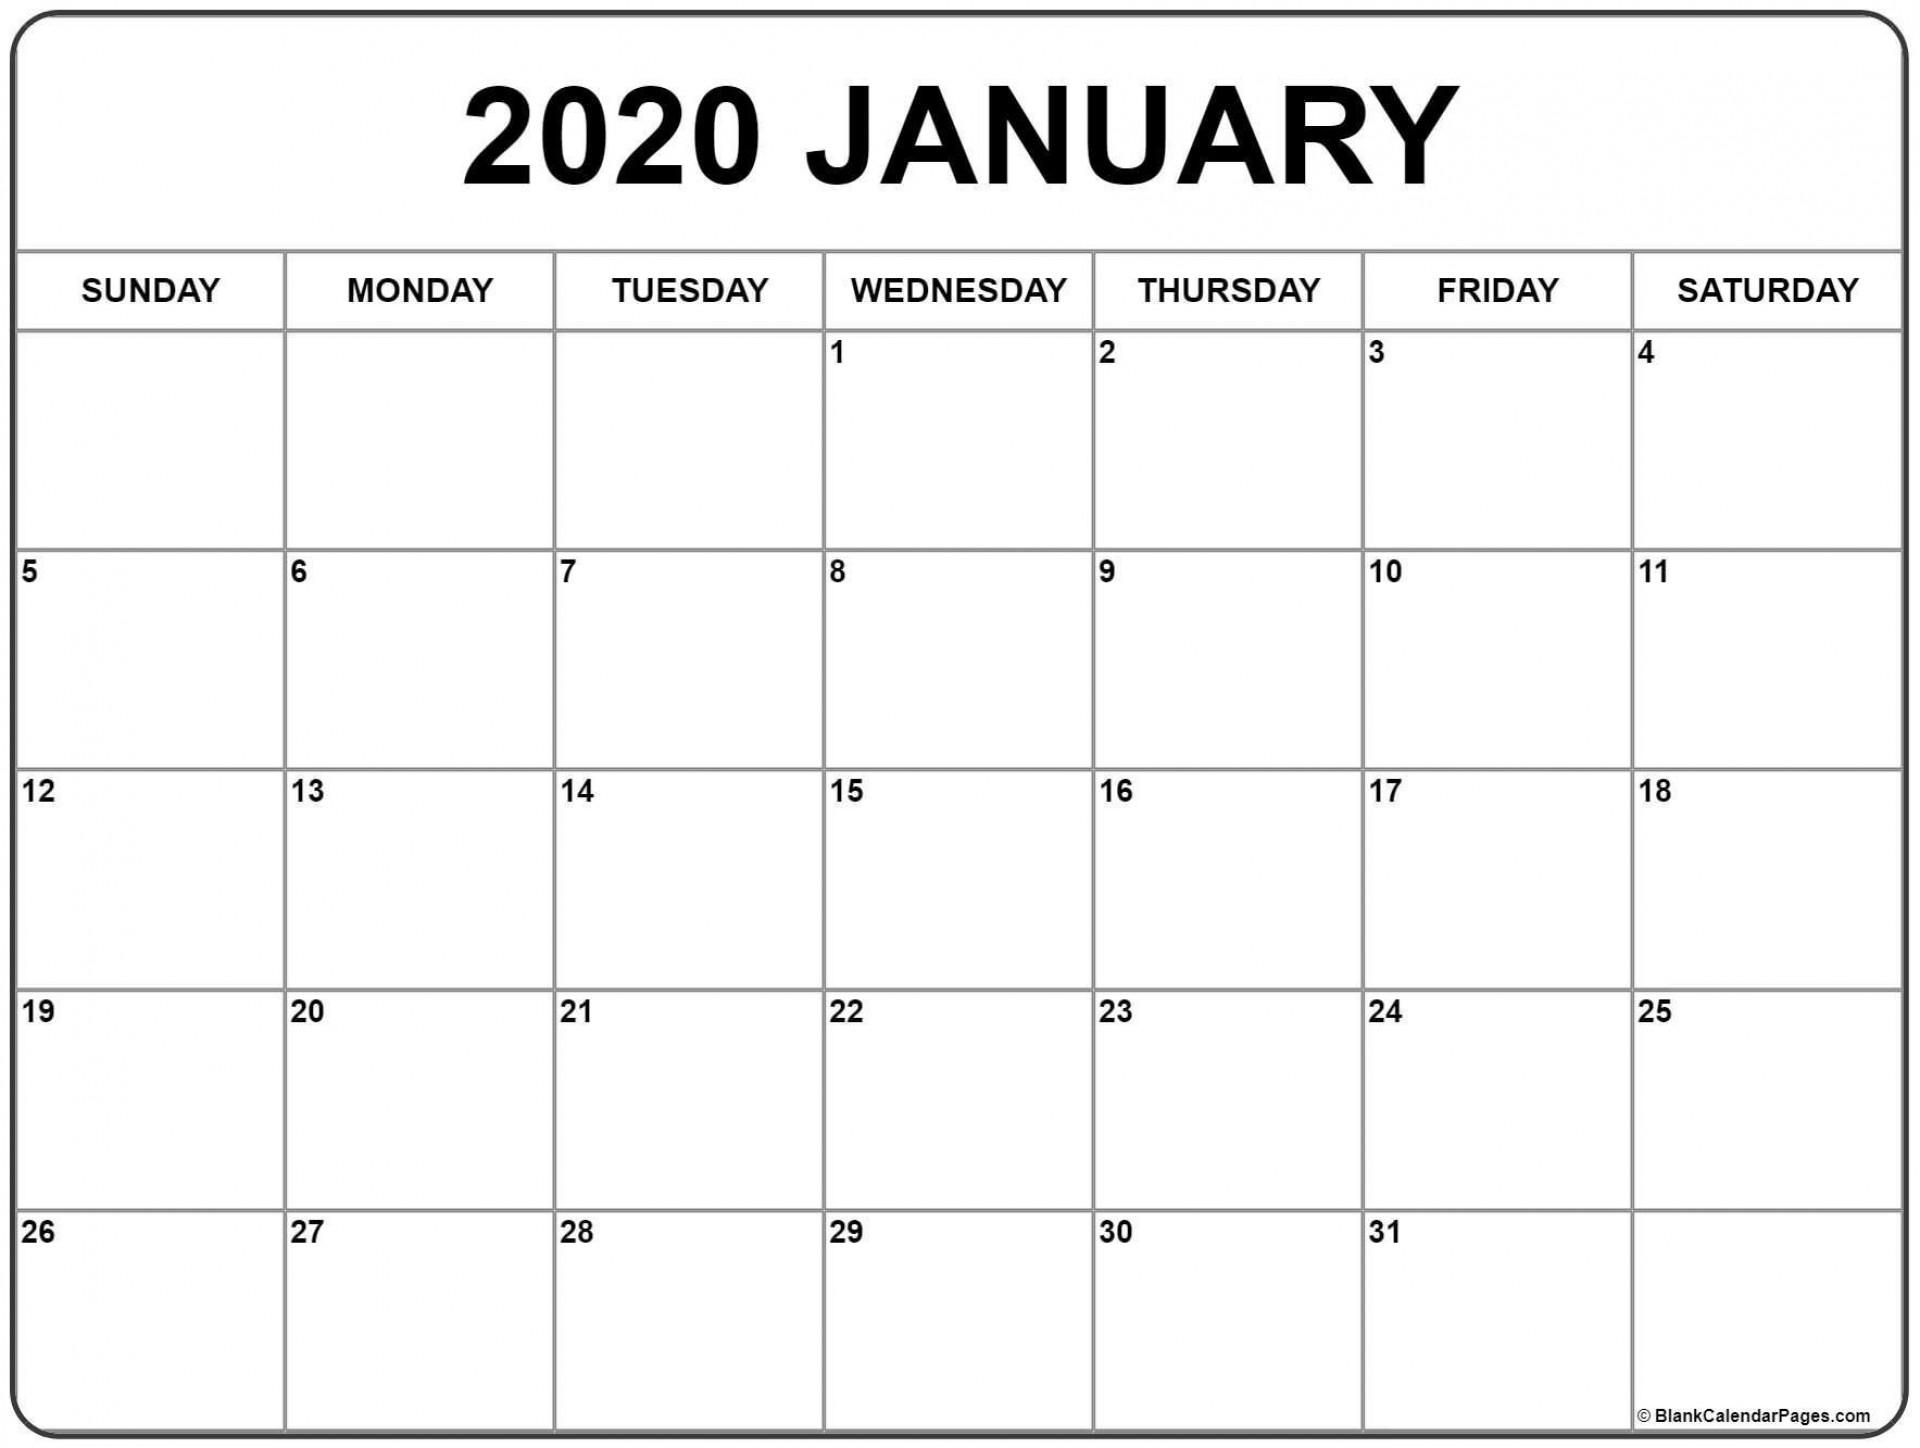 003 Stunning Word 2020 Monthly Calendar Template Image  Uk Free1920